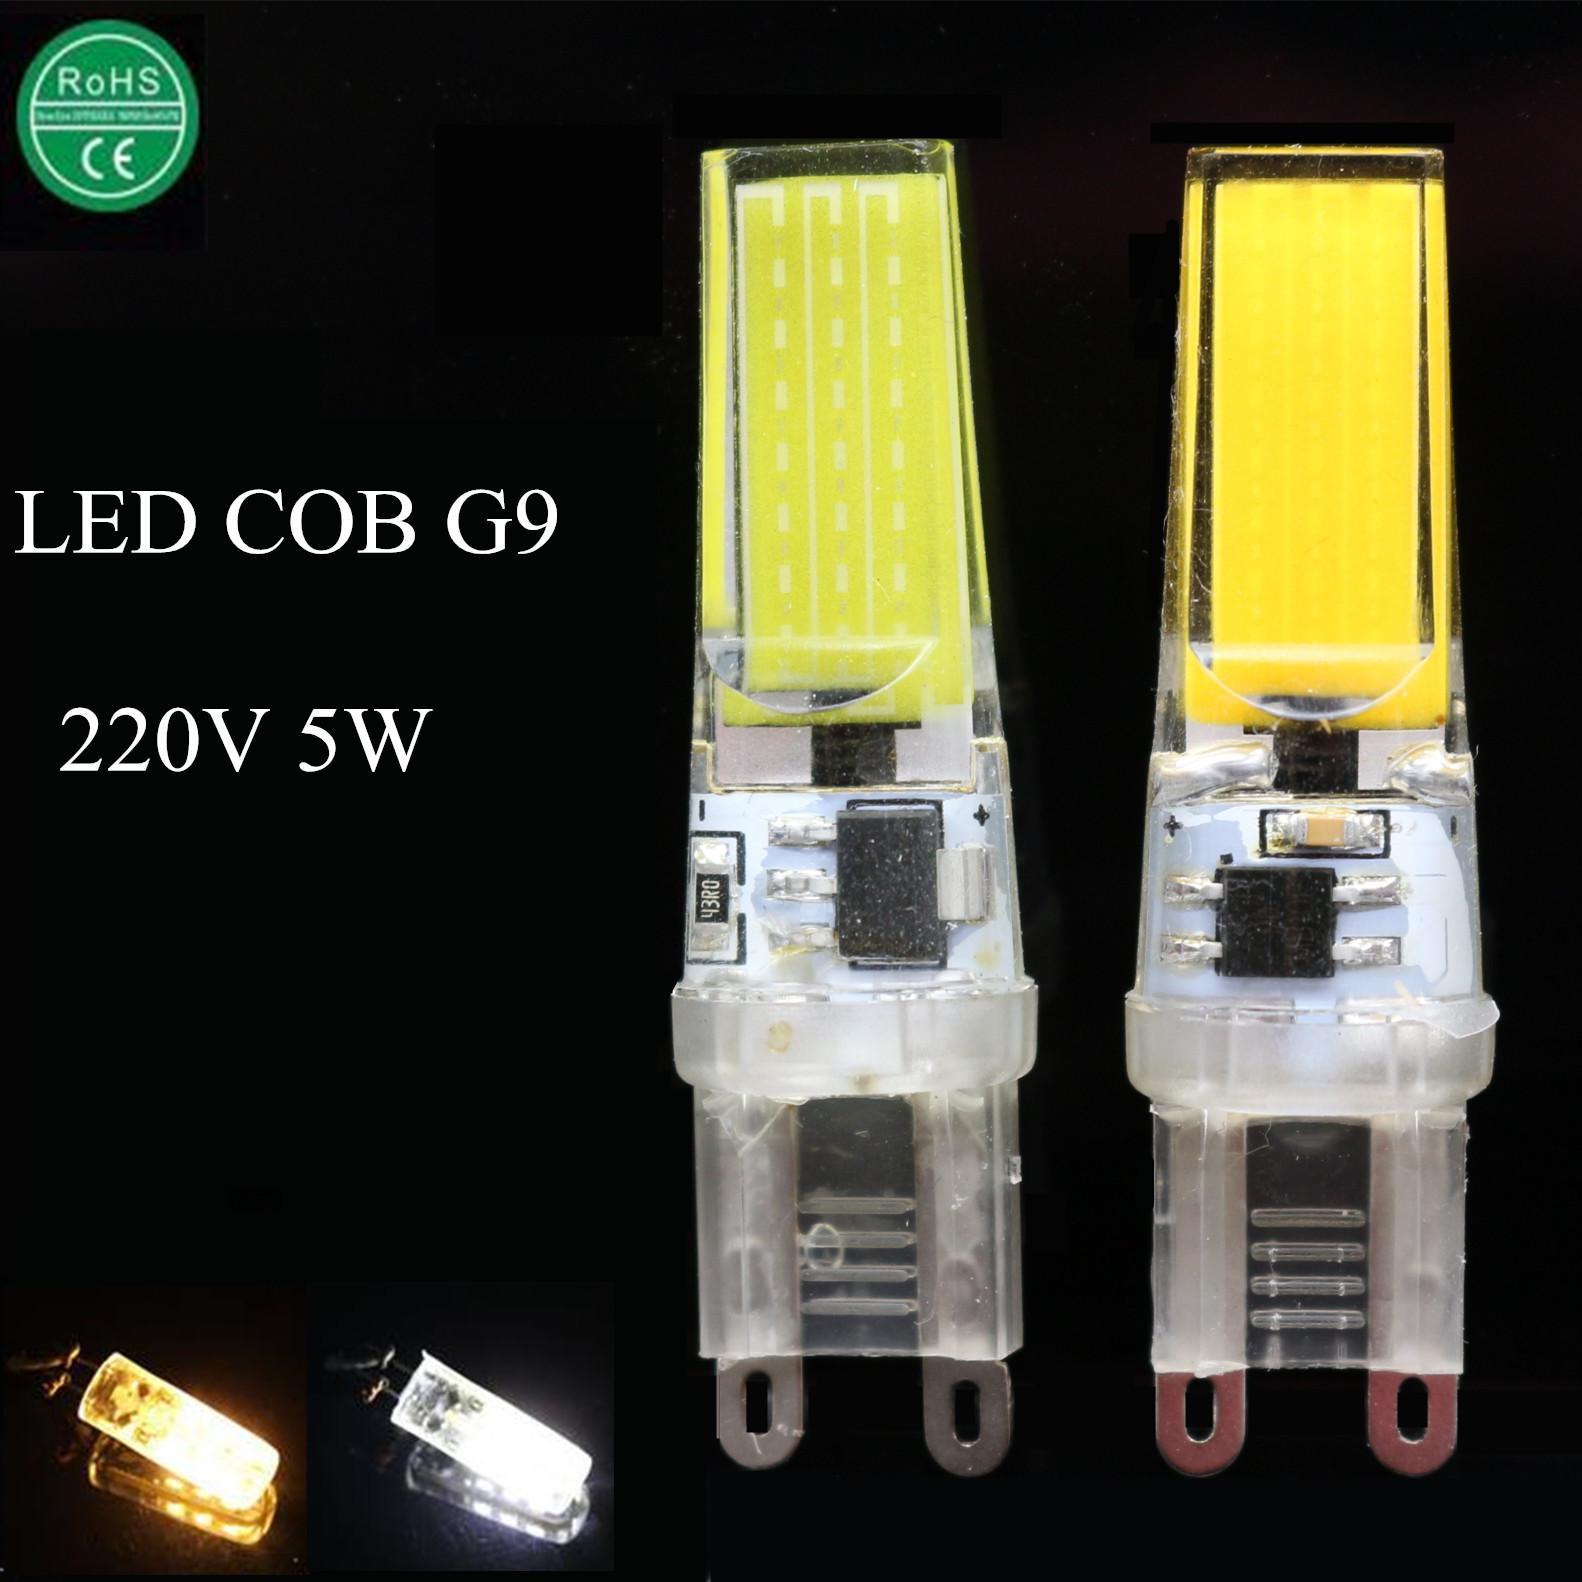 1x new led g9 light bulb 5w smd2835 220v 240v lamparas led lamp g9 spotlight ampoule luz. Black Bedroom Furniture Sets. Home Design Ideas